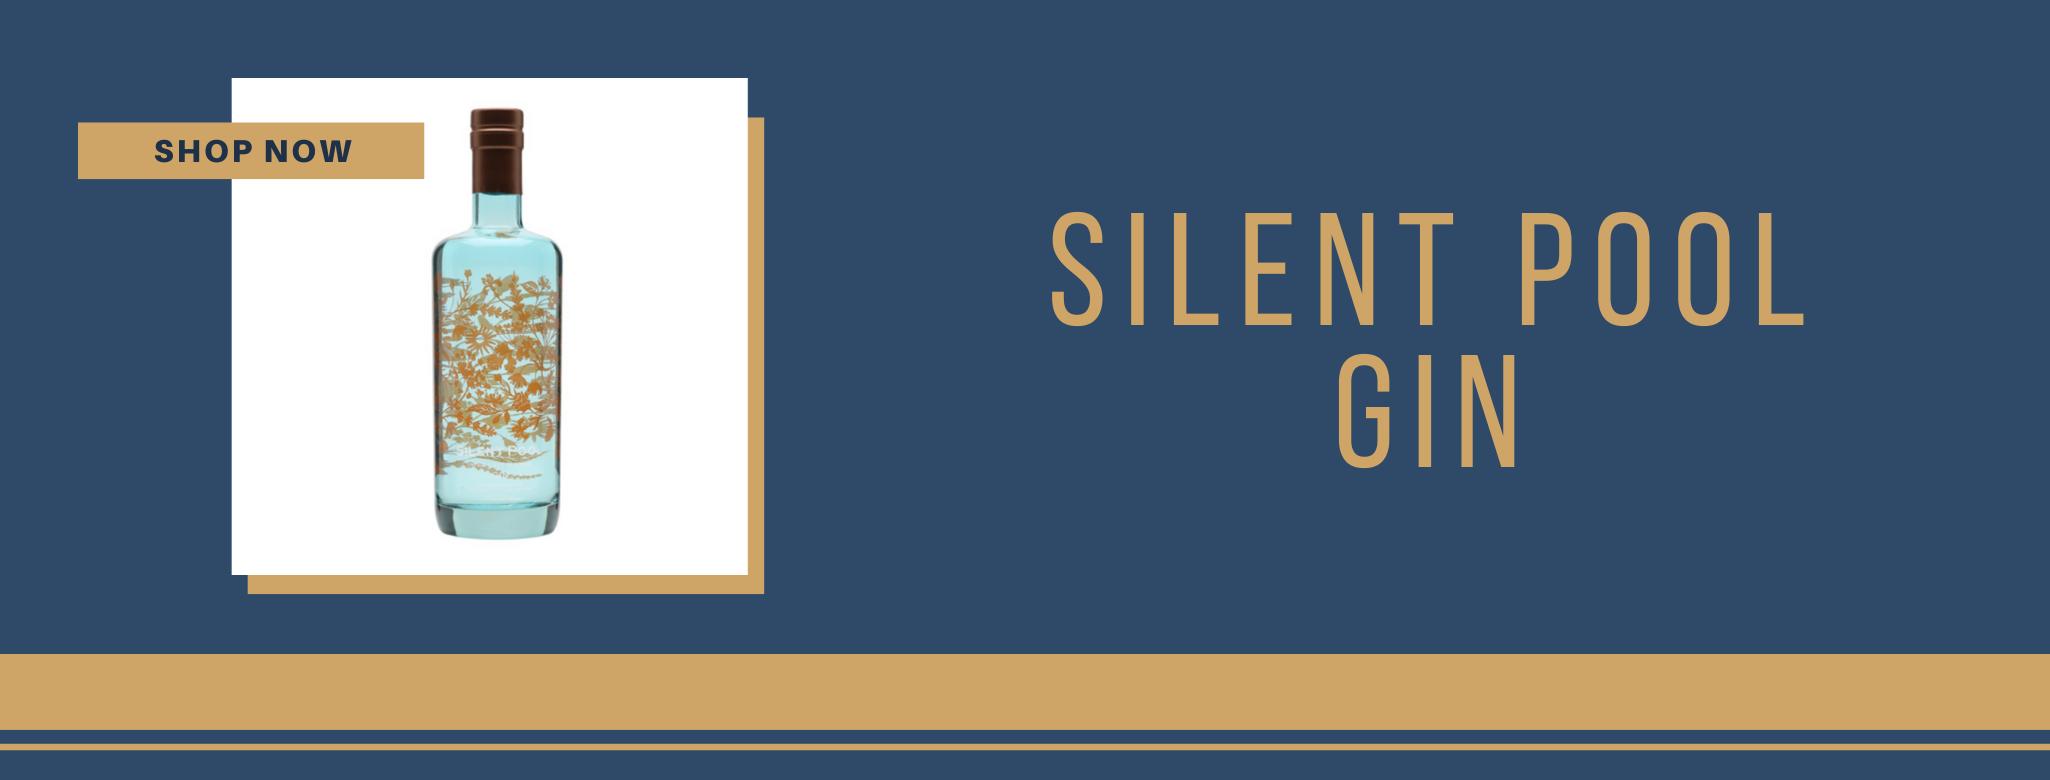 Buy Silent Pool gin online